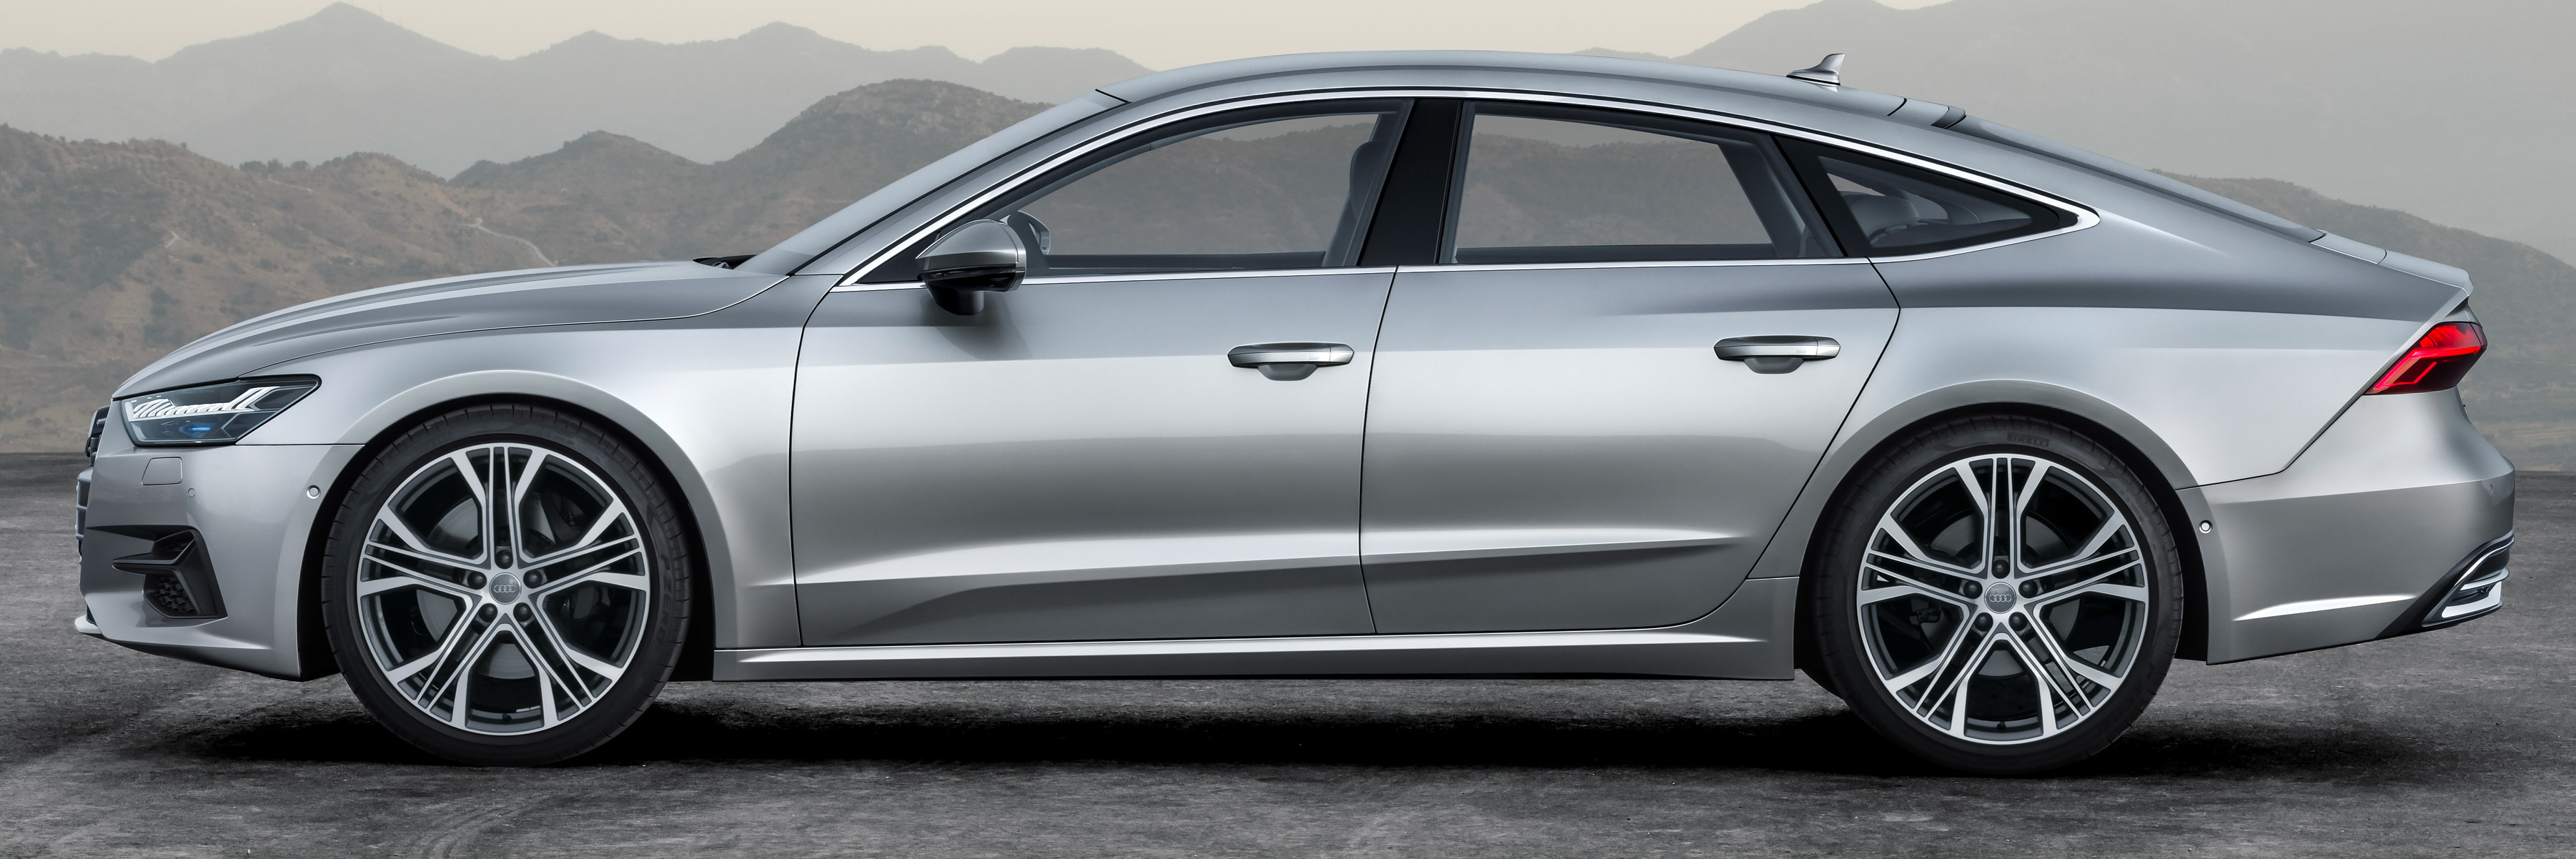 2018 Audi A7 Sportback All Models Hybrid Audi Ai Paul